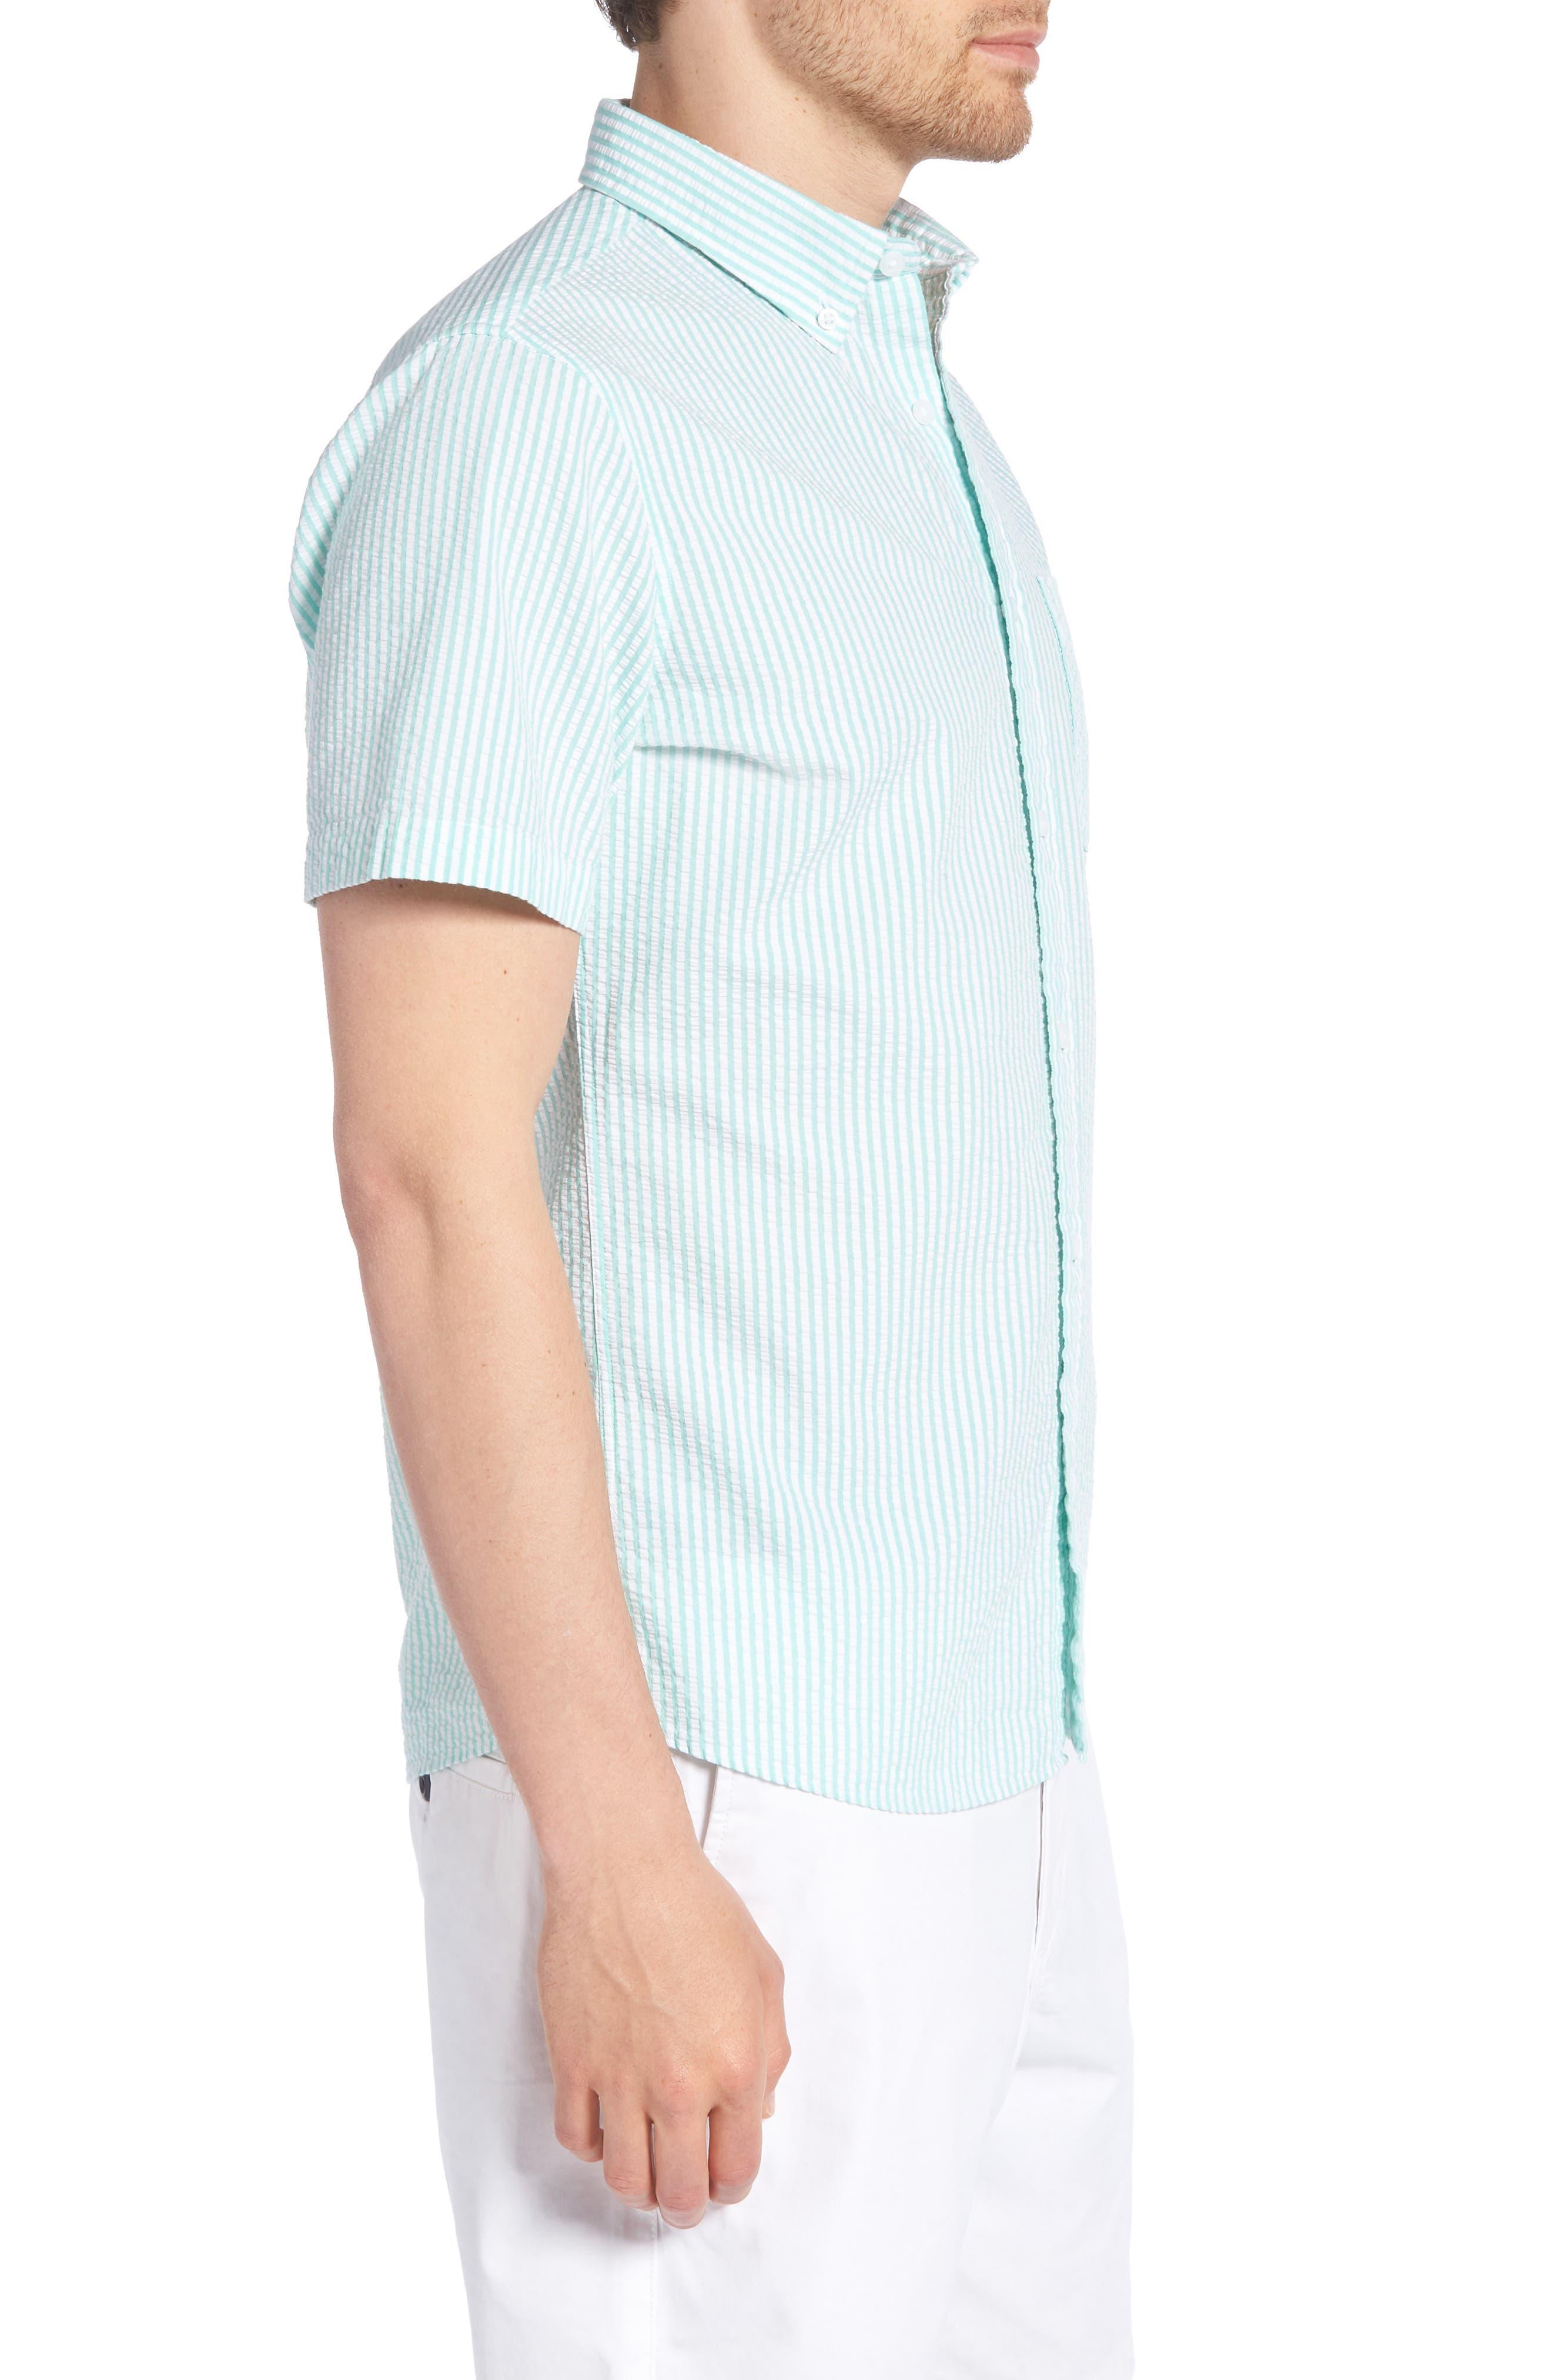 Trim Fit Seersucker Short Sleeve Sport Shirt,                             Alternate thumbnail 4, color,                             White Green Seersucker Stripe